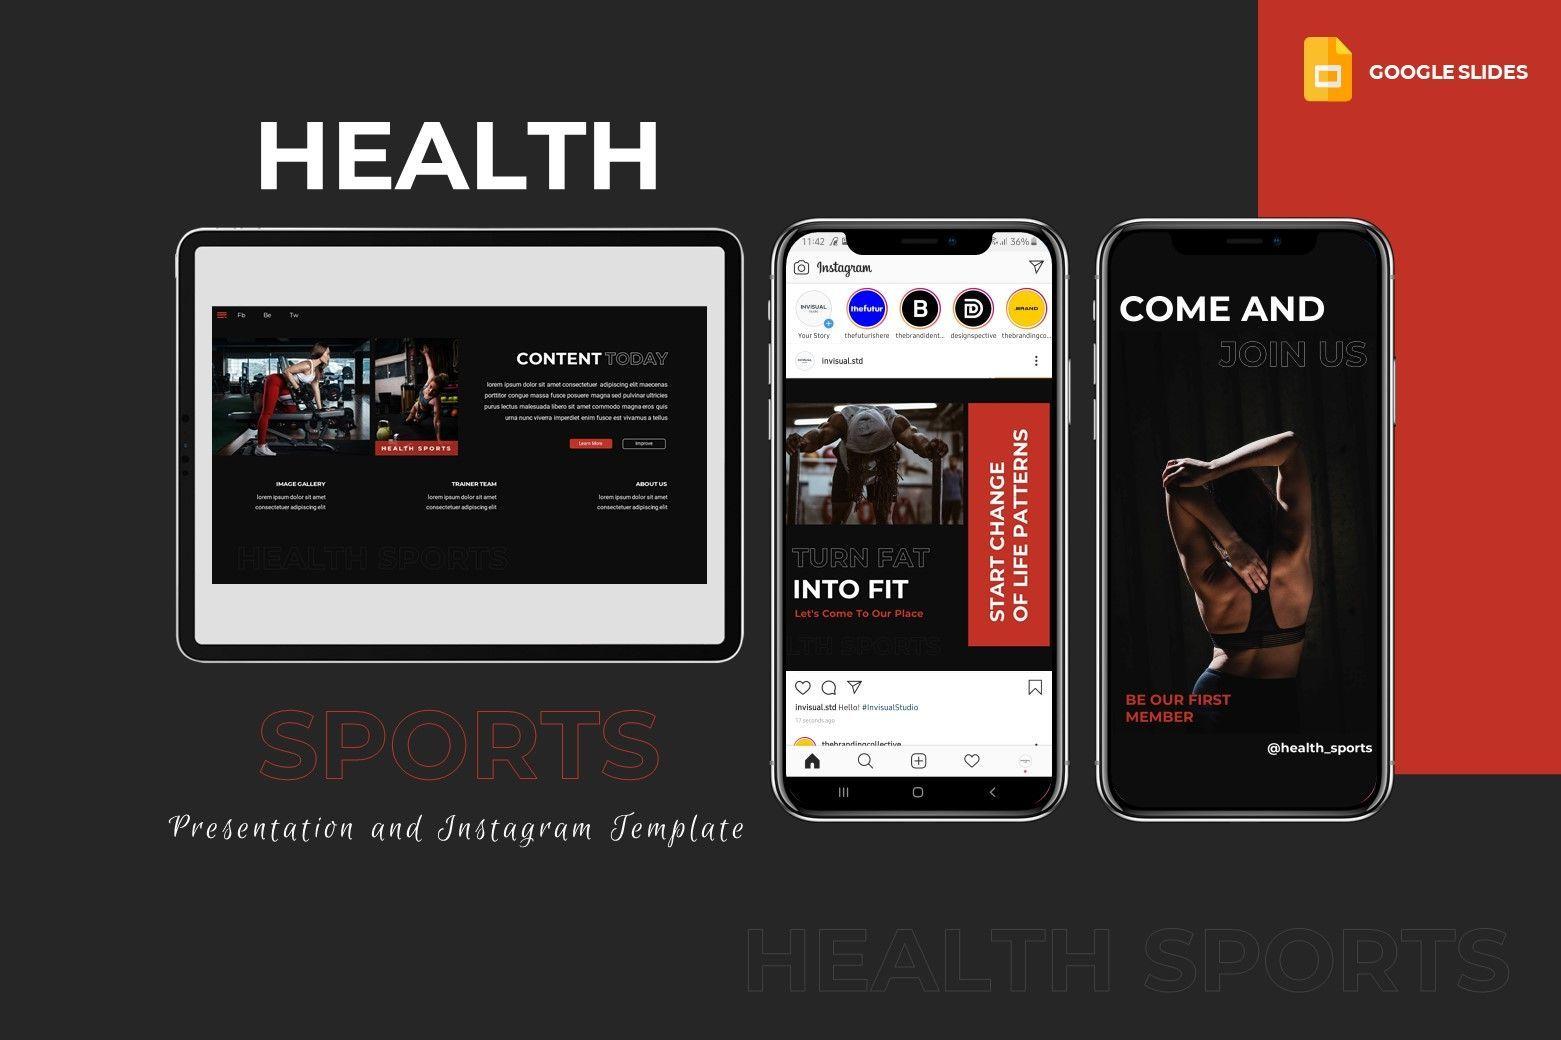 Sport - Google Slides Template, 07994, Presentation Templates — PoweredTemplate.com